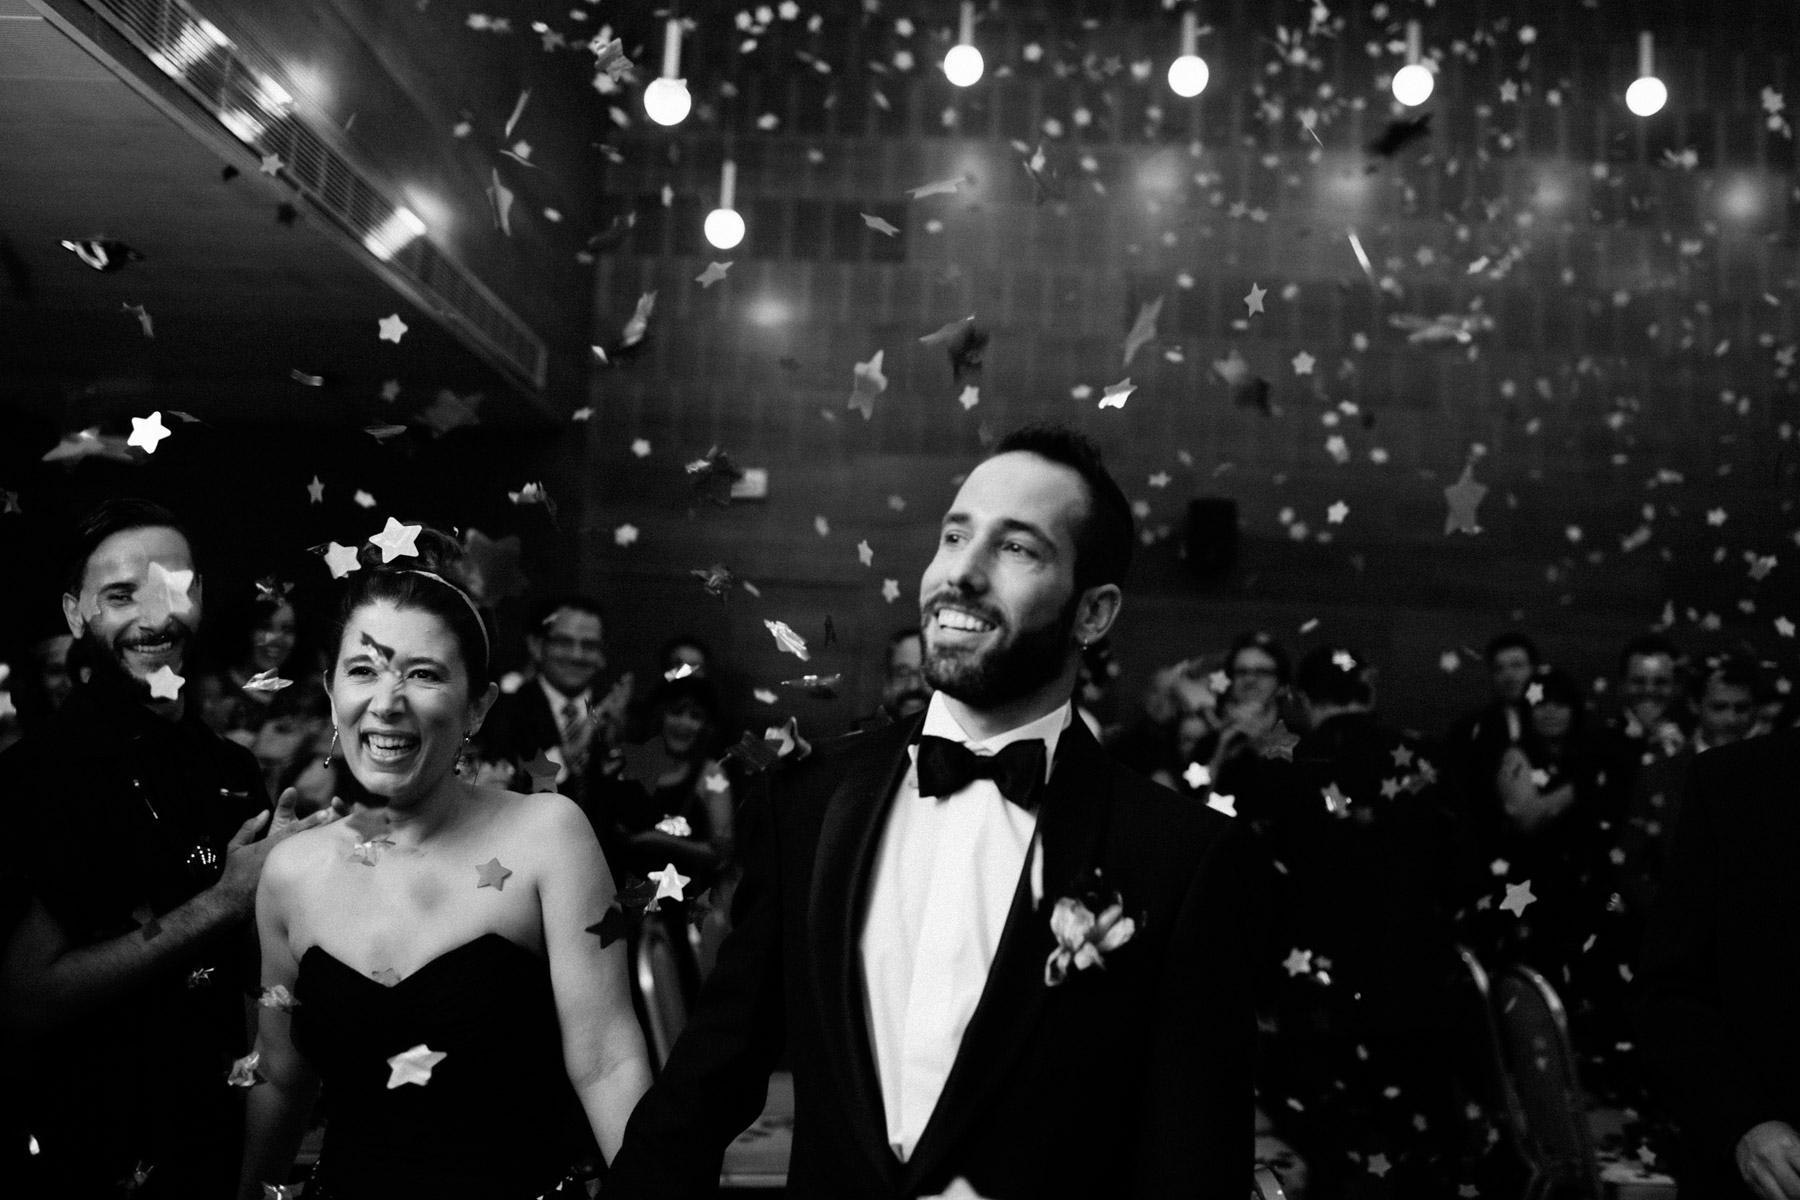 fotografo de bodas Jairo Crena-59